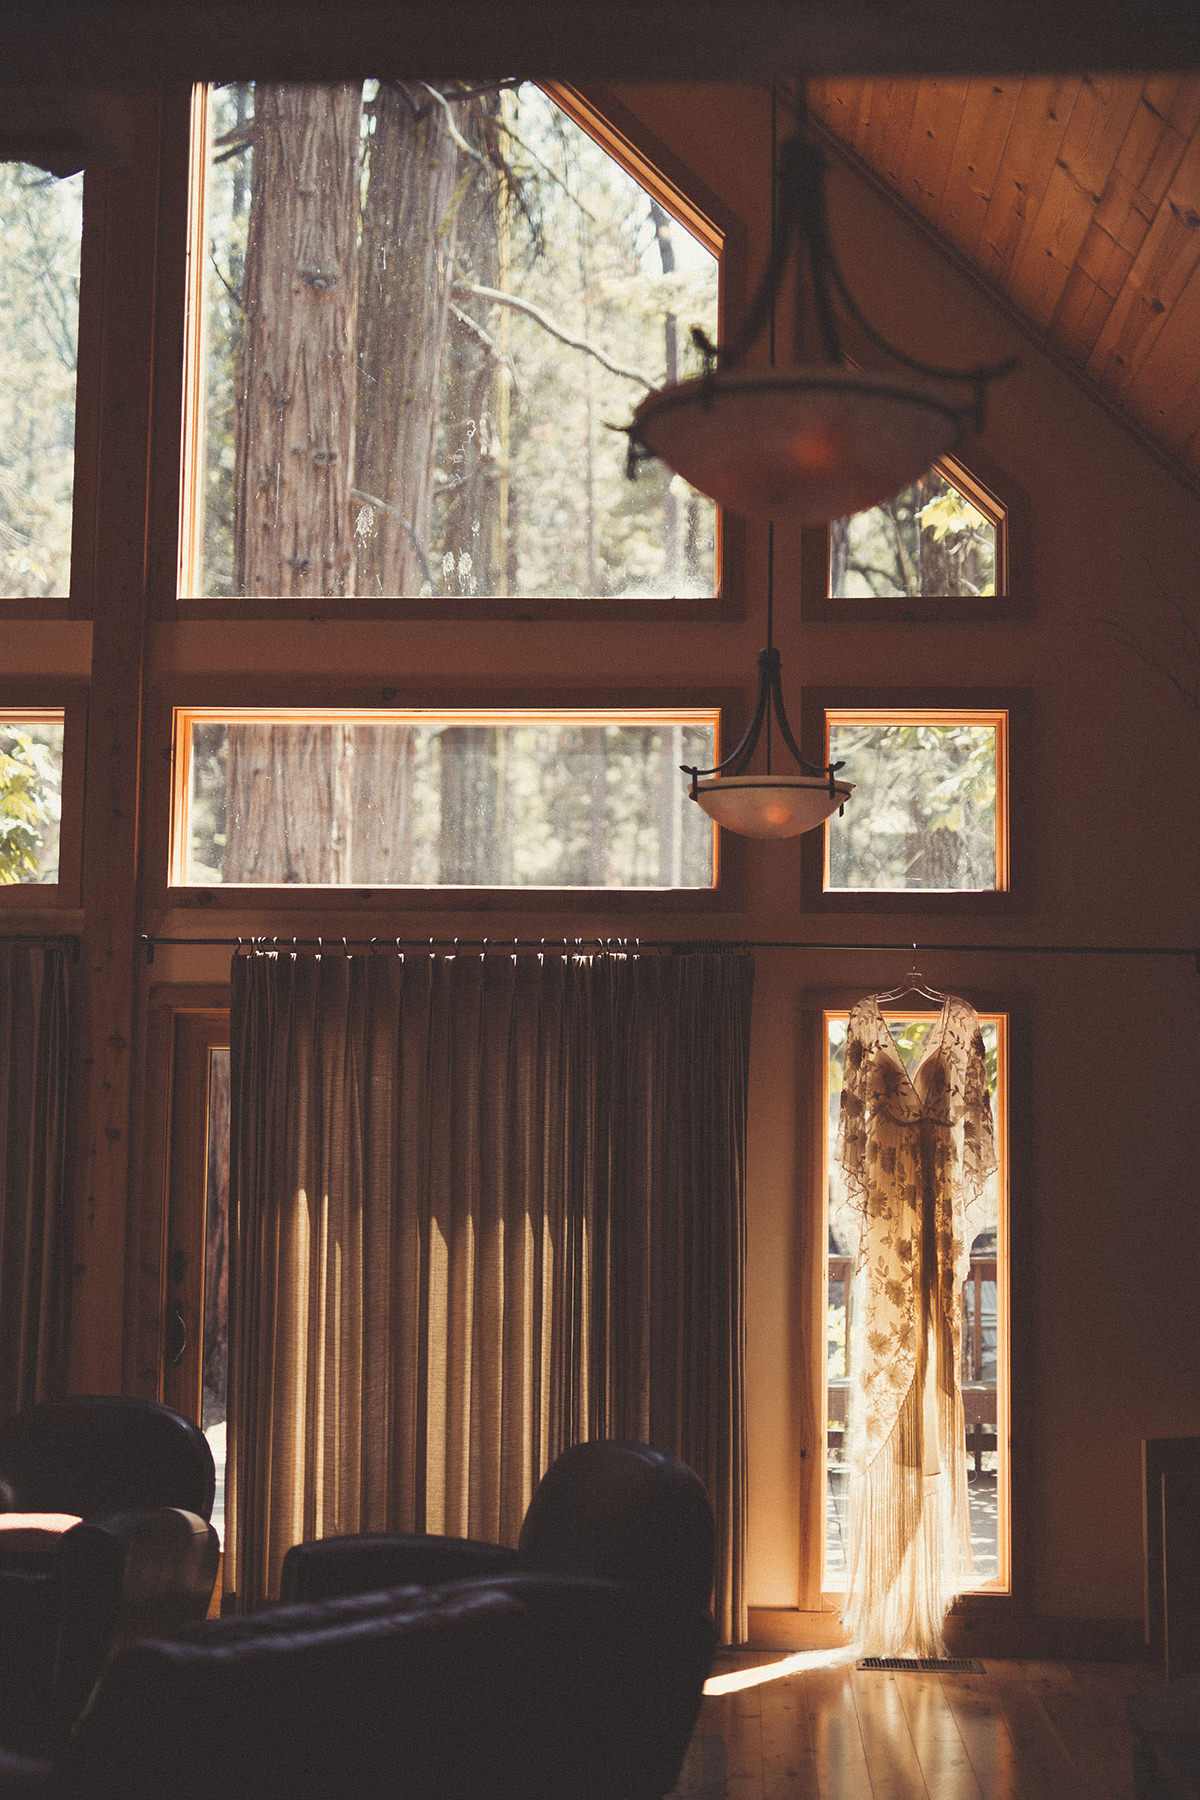 S&J - Wedding Photography Yosemite National Park SJ Wedding Photography Yosemite 031